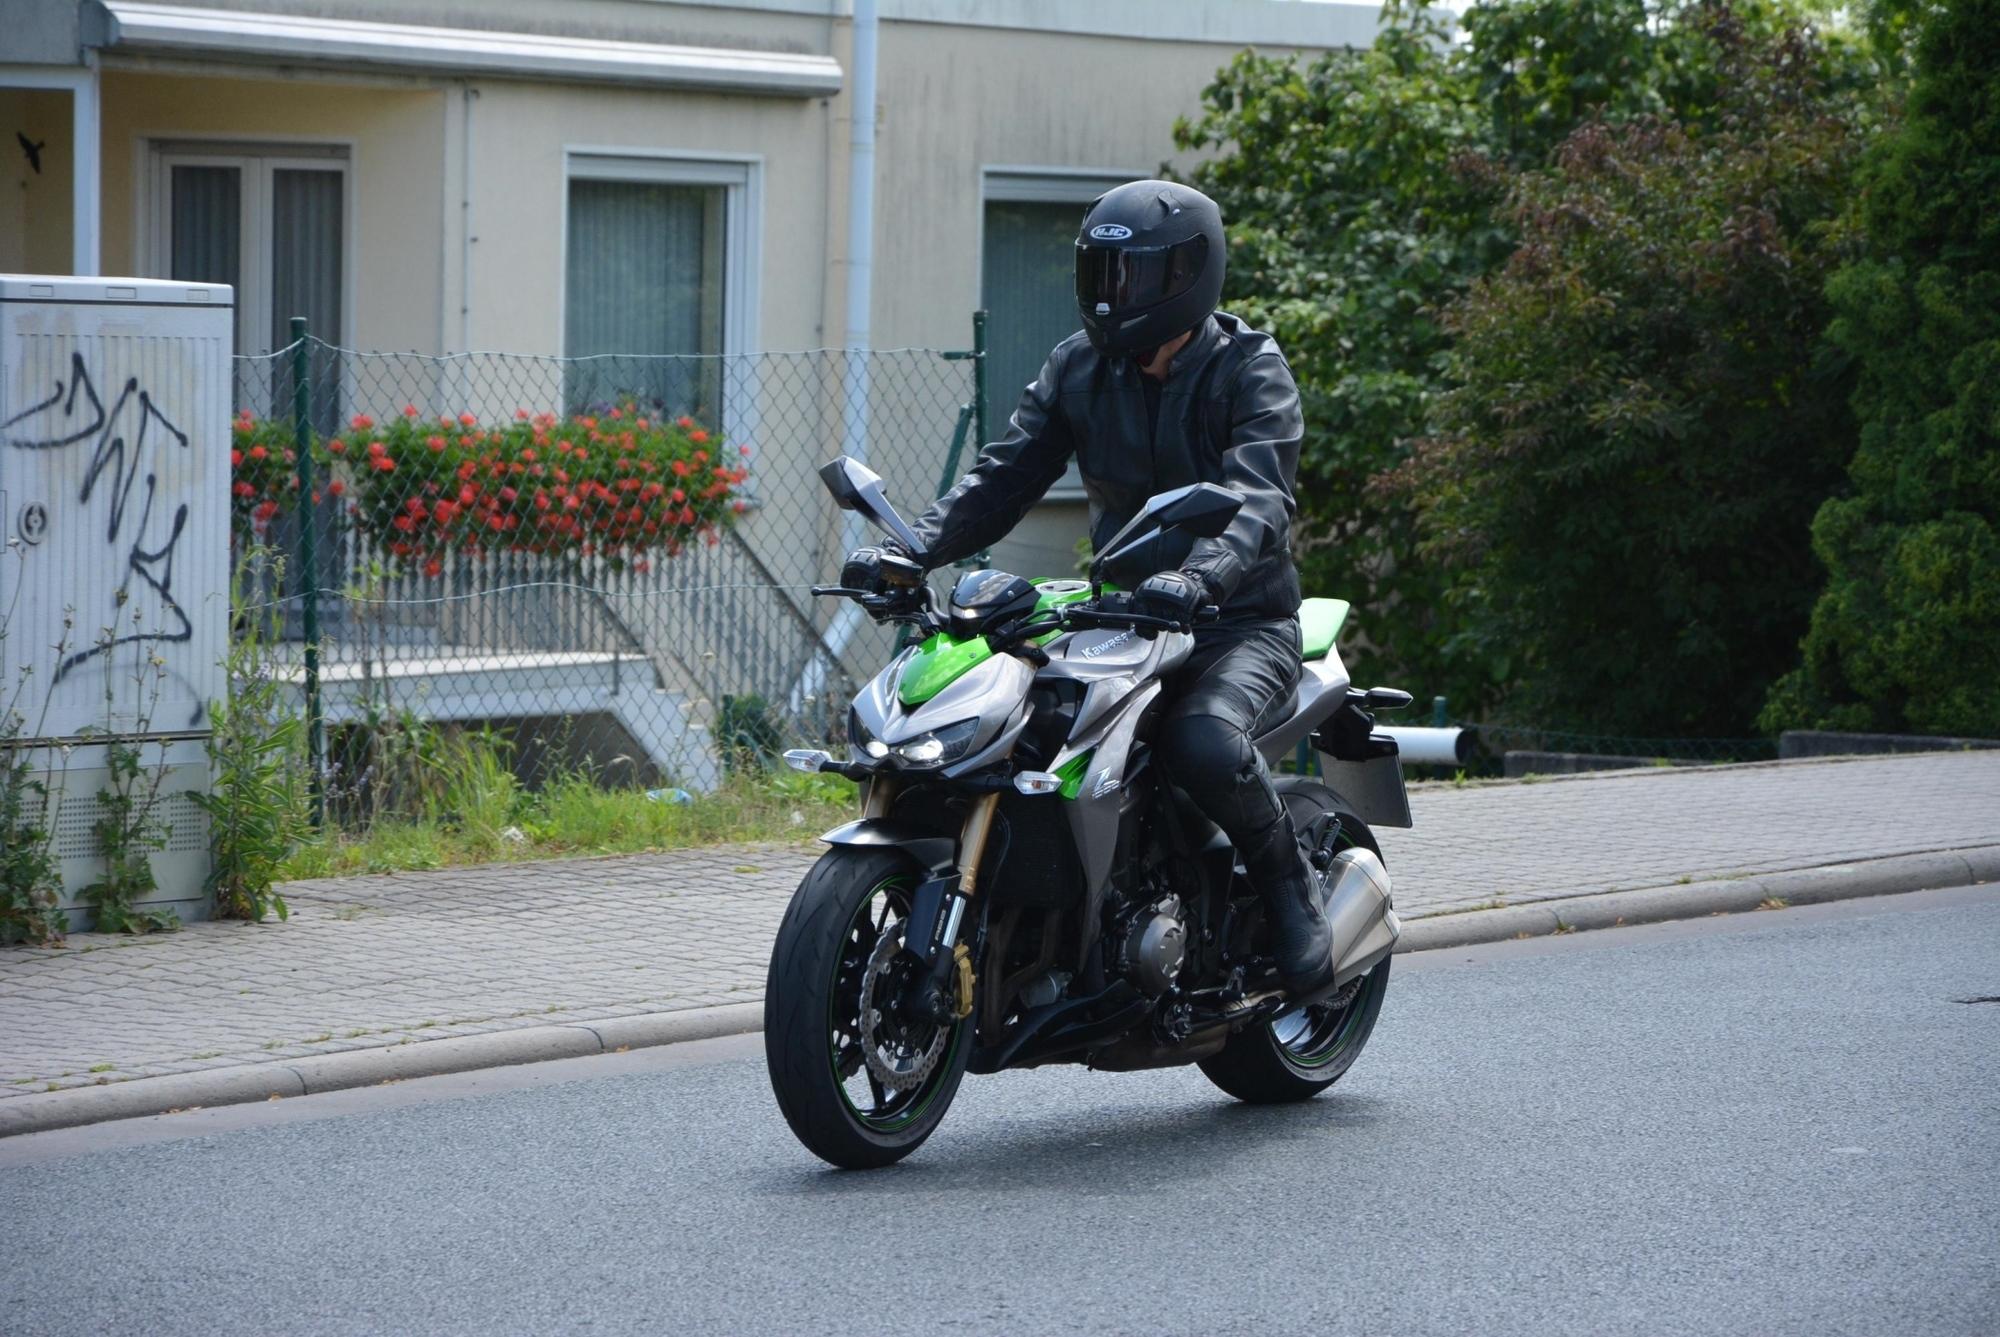 Test: Kawasaki Z 1000 Special Edition - Böser Blick, gute Manieren